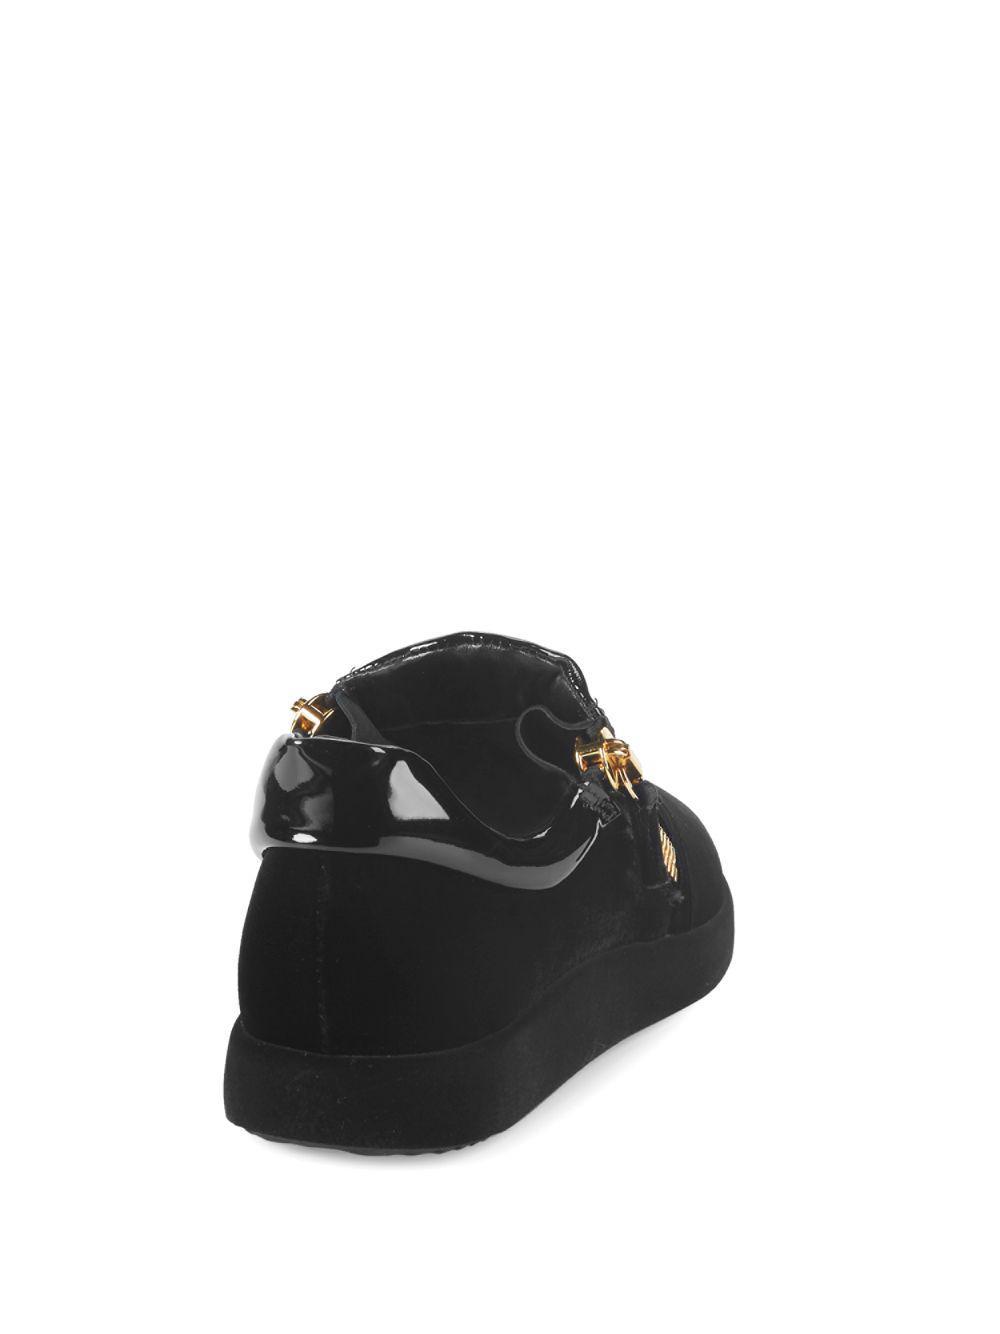 Giuseppe Zanotti Leather Double Zip Slip-on Sneakers in Black